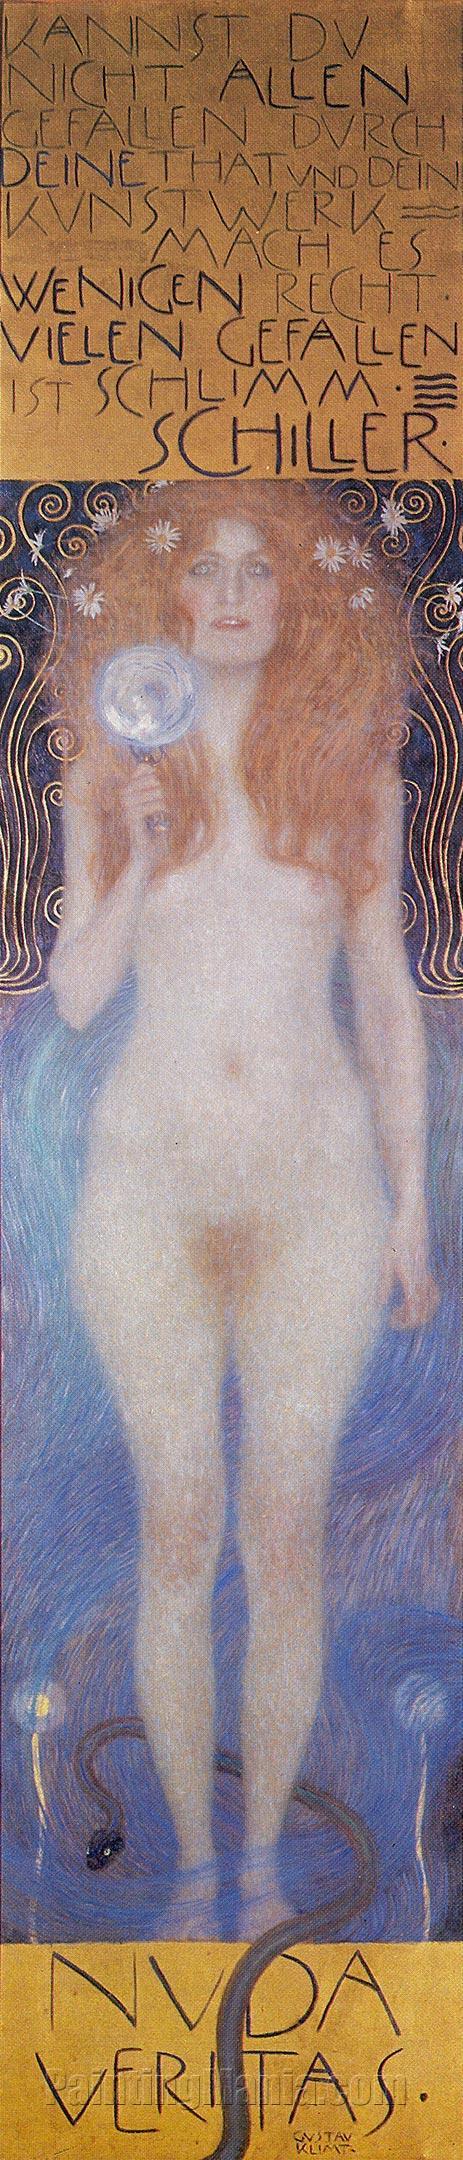 Nude Veritas